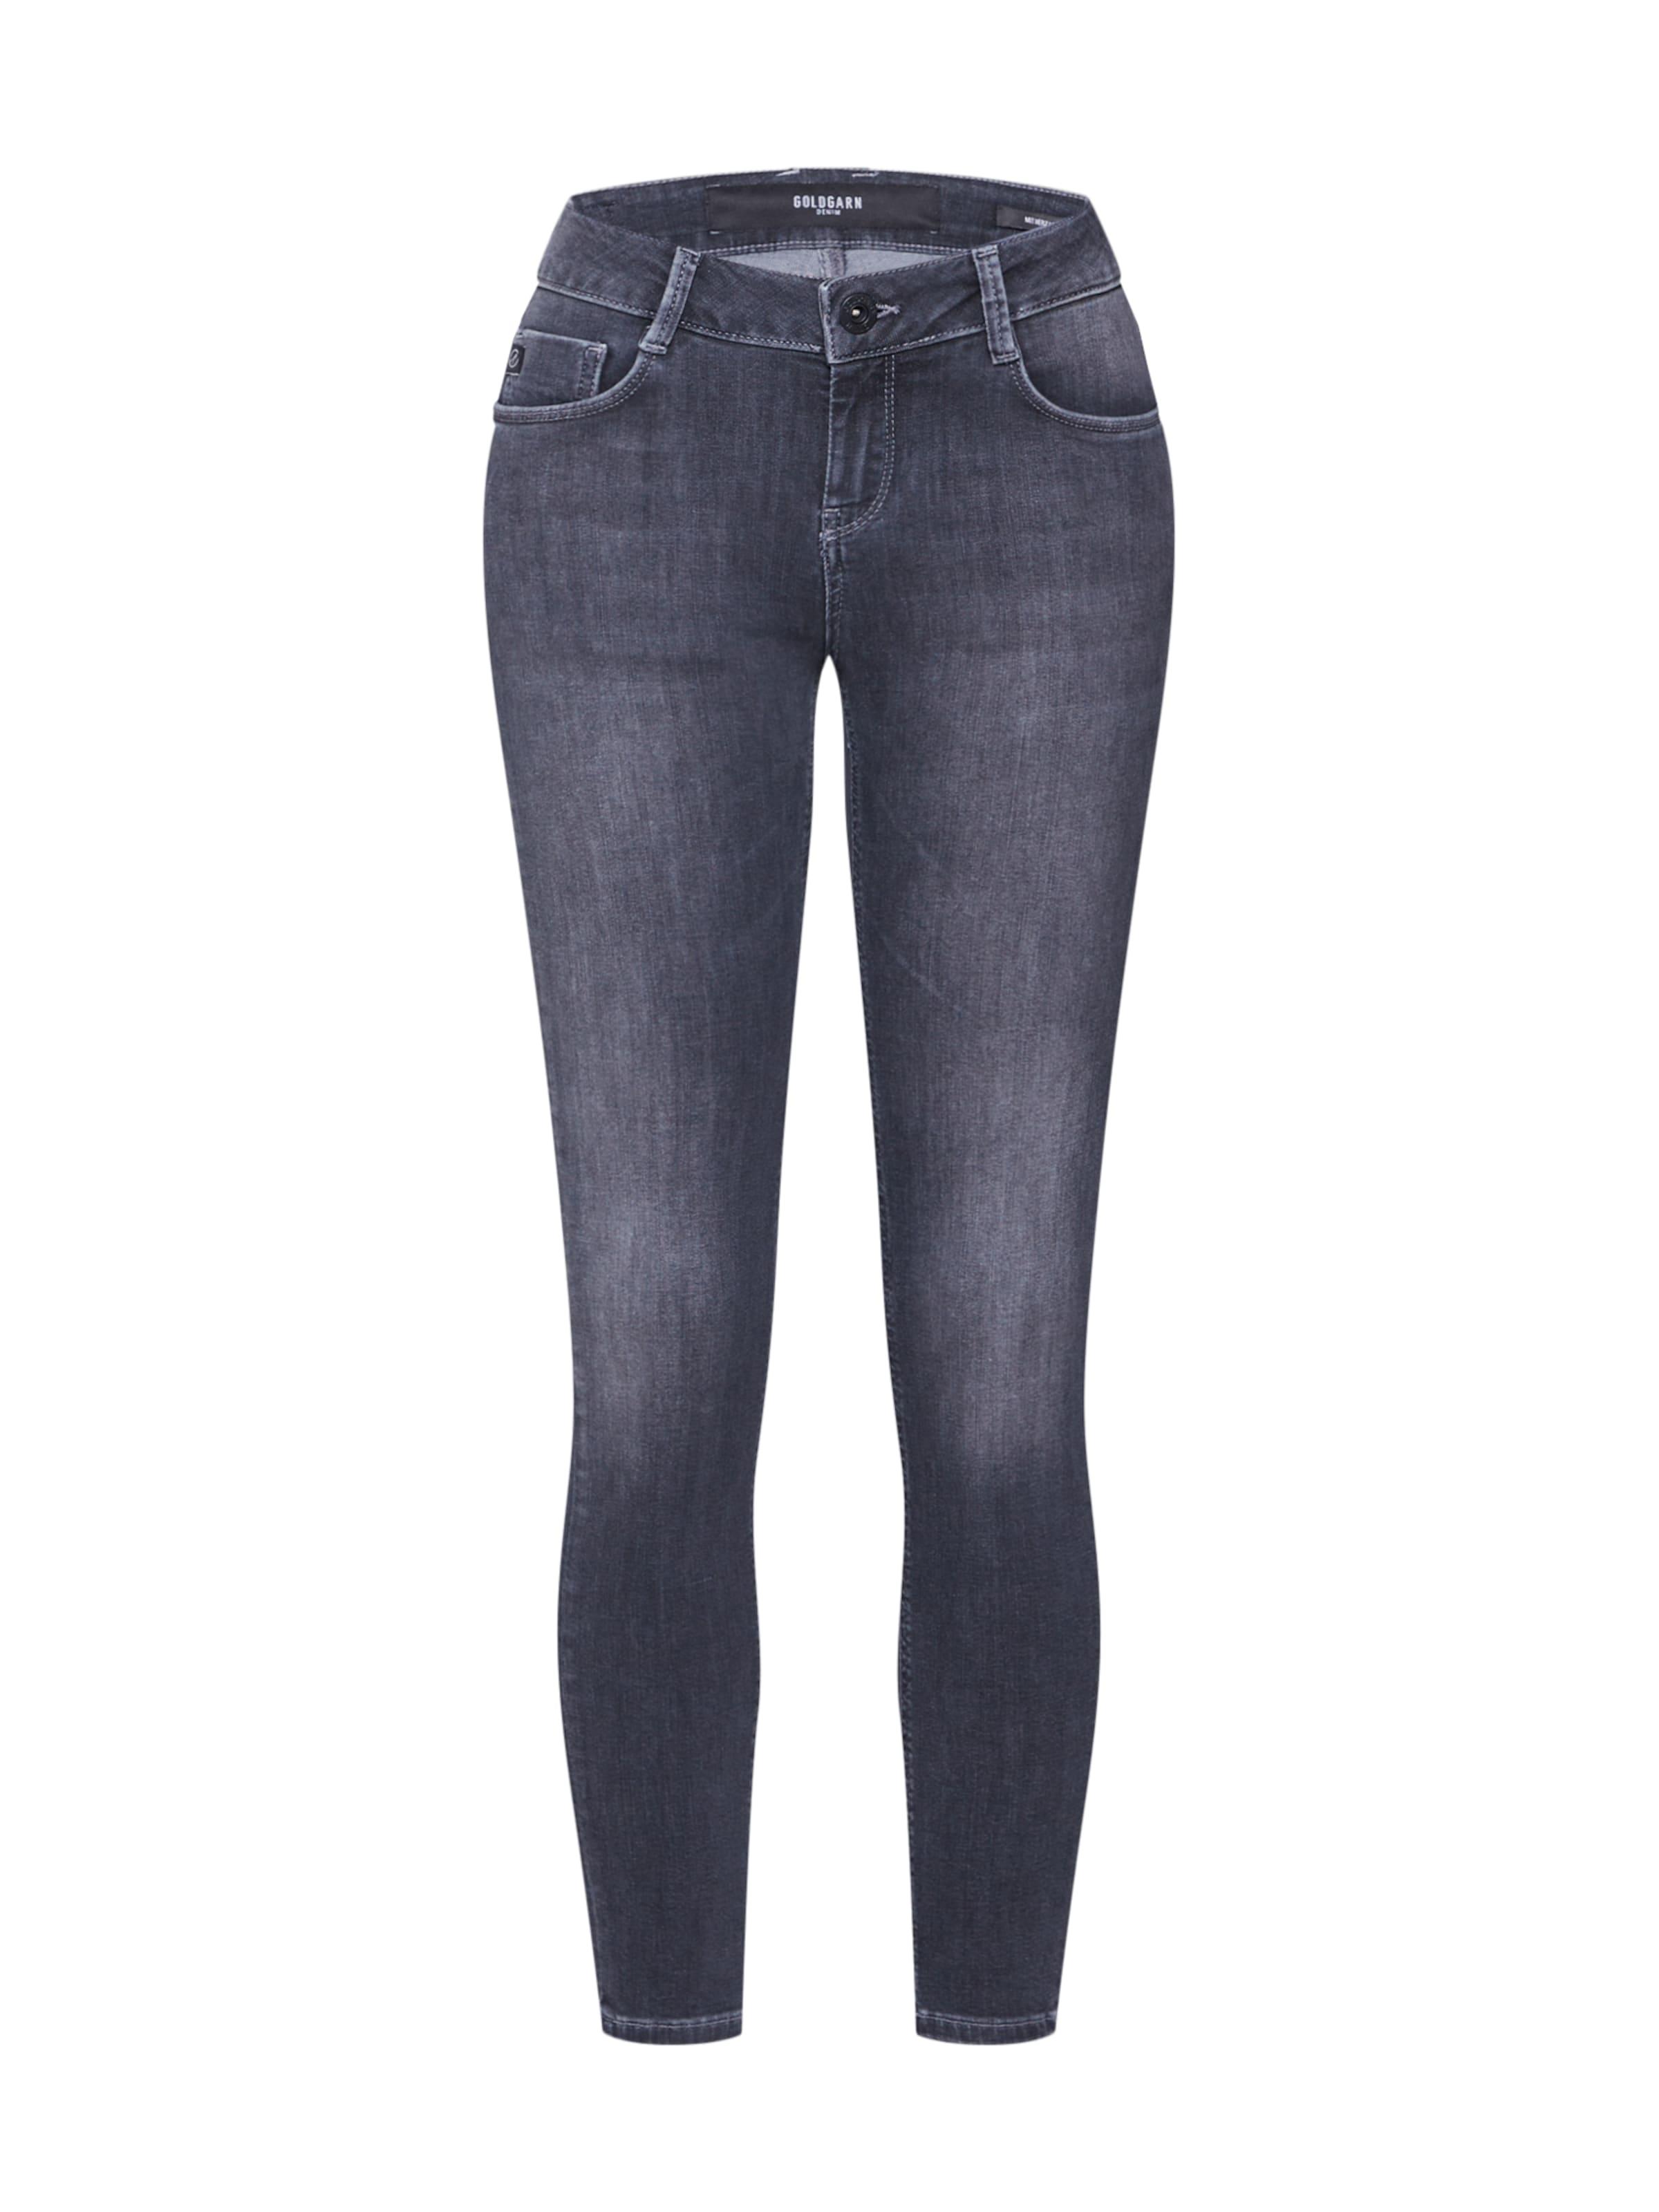 Grau Goldgarn Jeans Jeans In Goldgarn 'jungbusch' SqzVLpjUMG